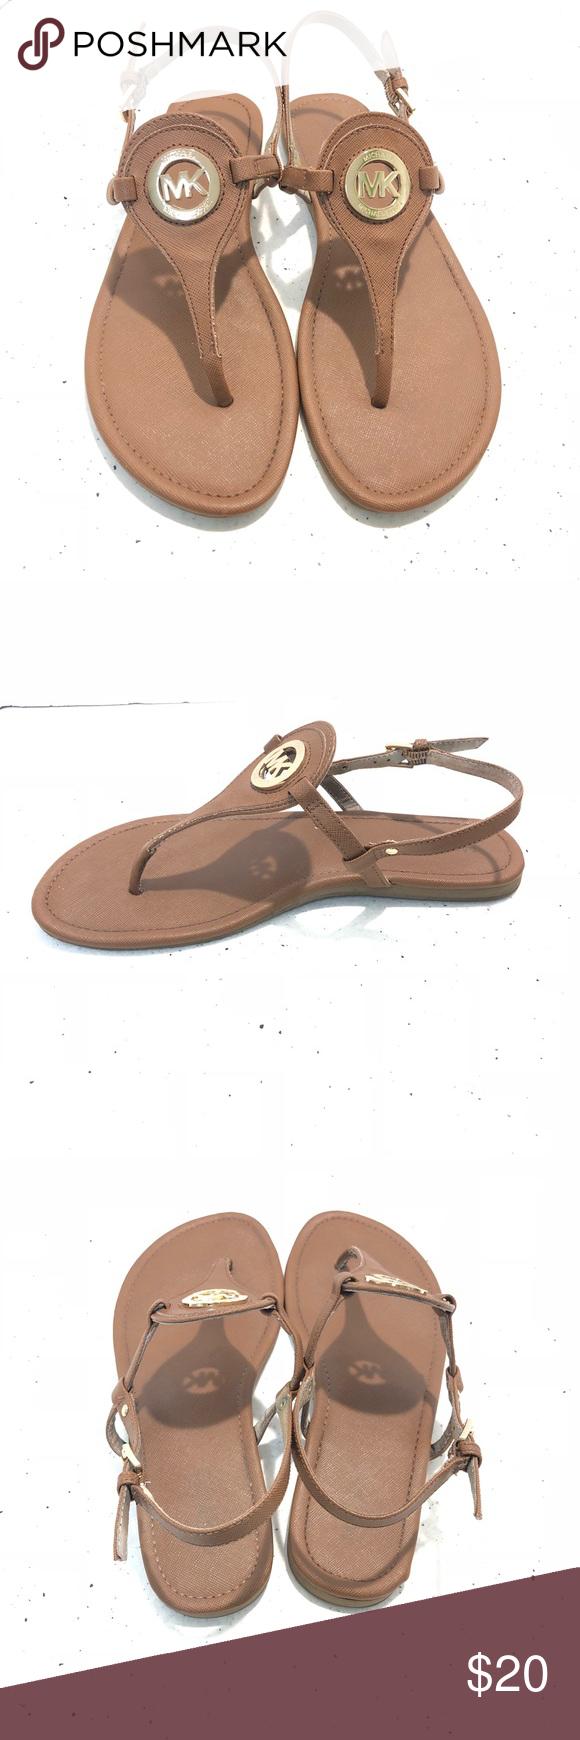 Michael Kors Tan T Strap Sandals T Strap Sandals Michael Kors Sandals Michael Kors Shoes